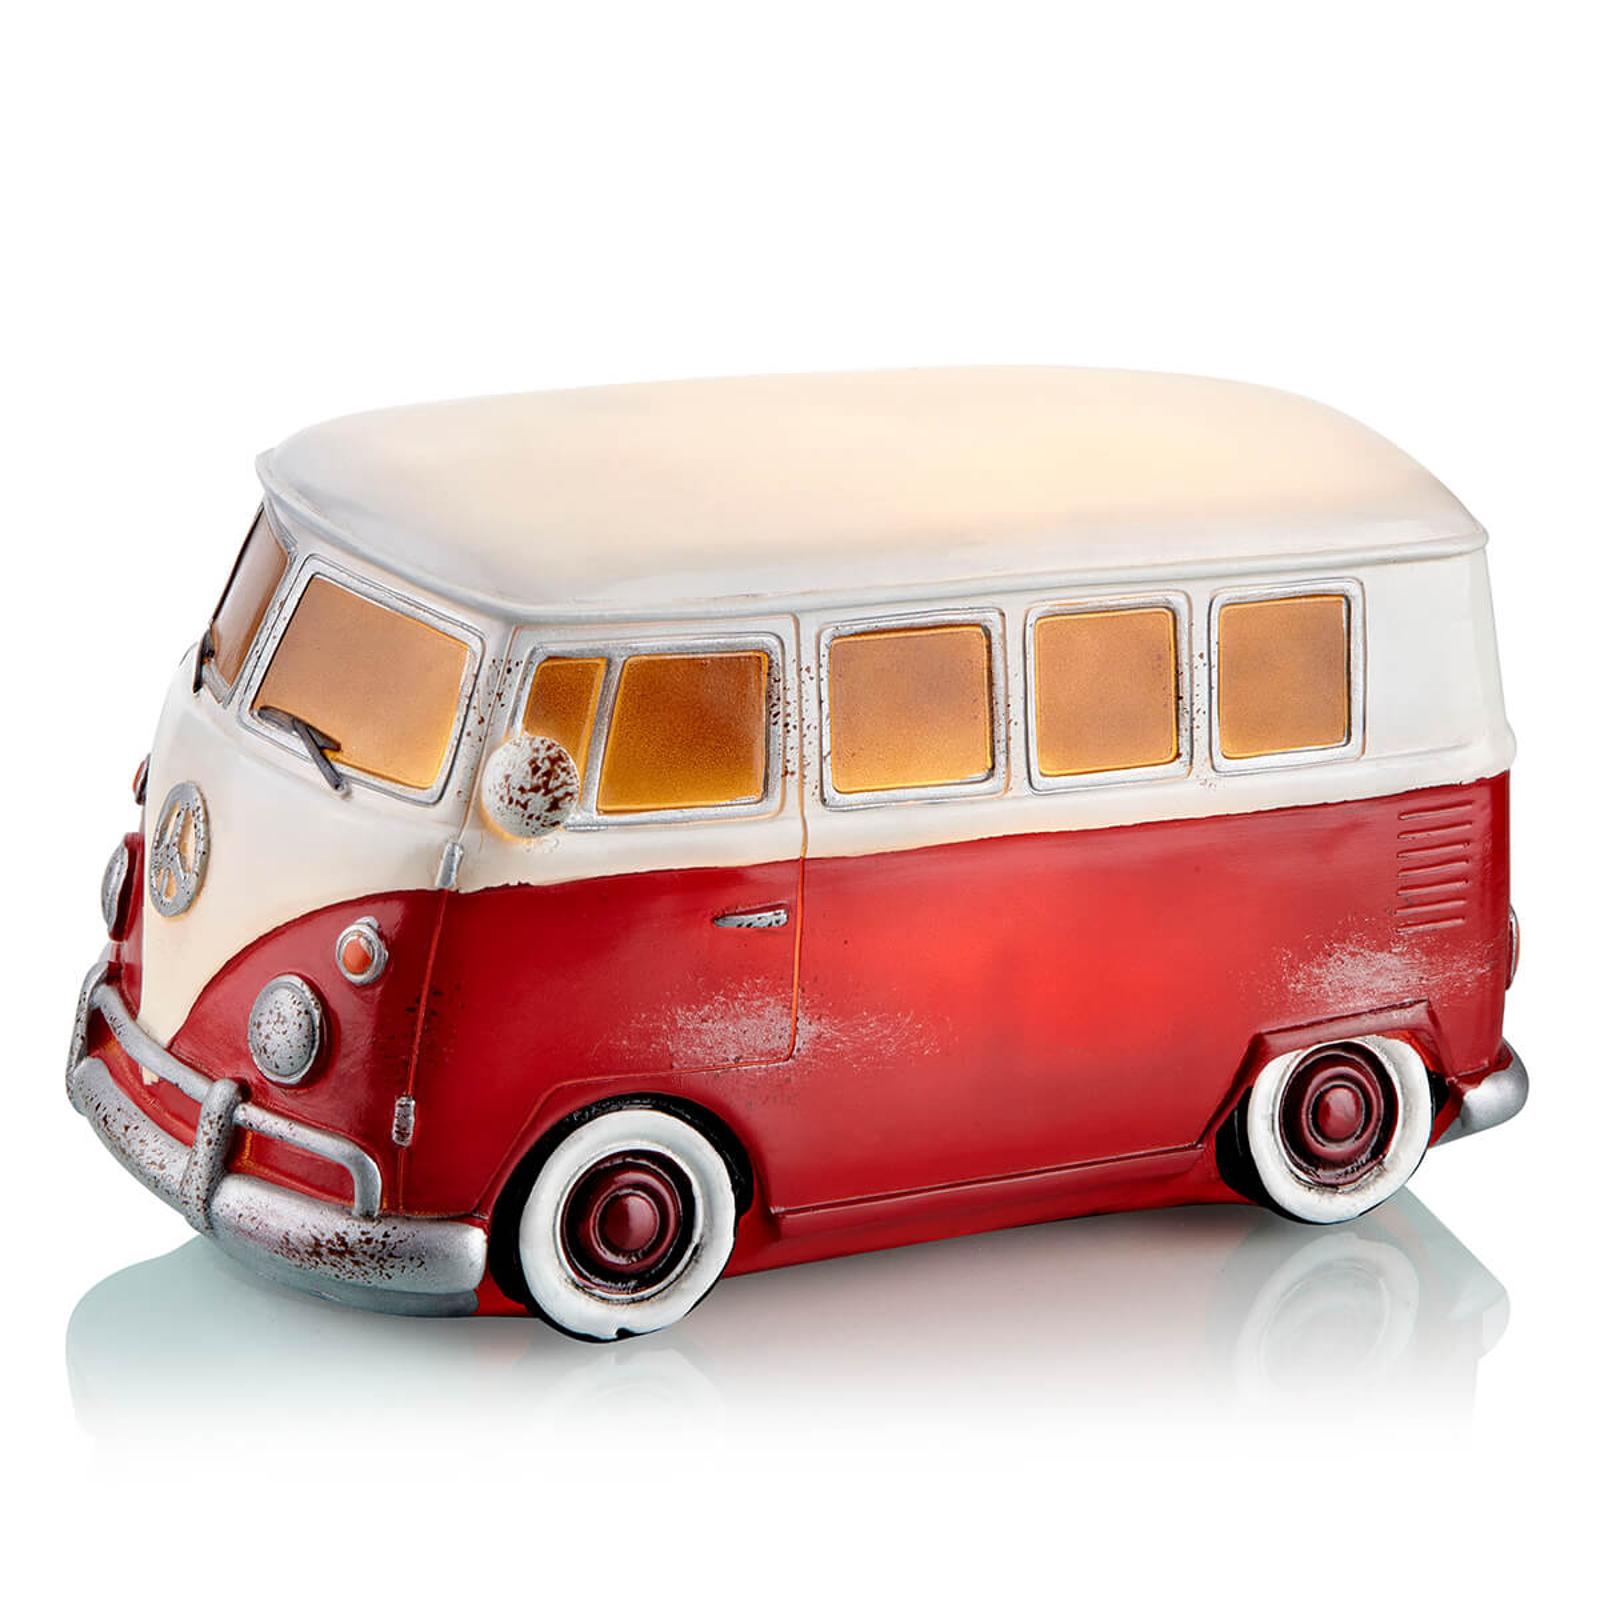 LED-lampan Nostalgi i kultig VW Buss-design